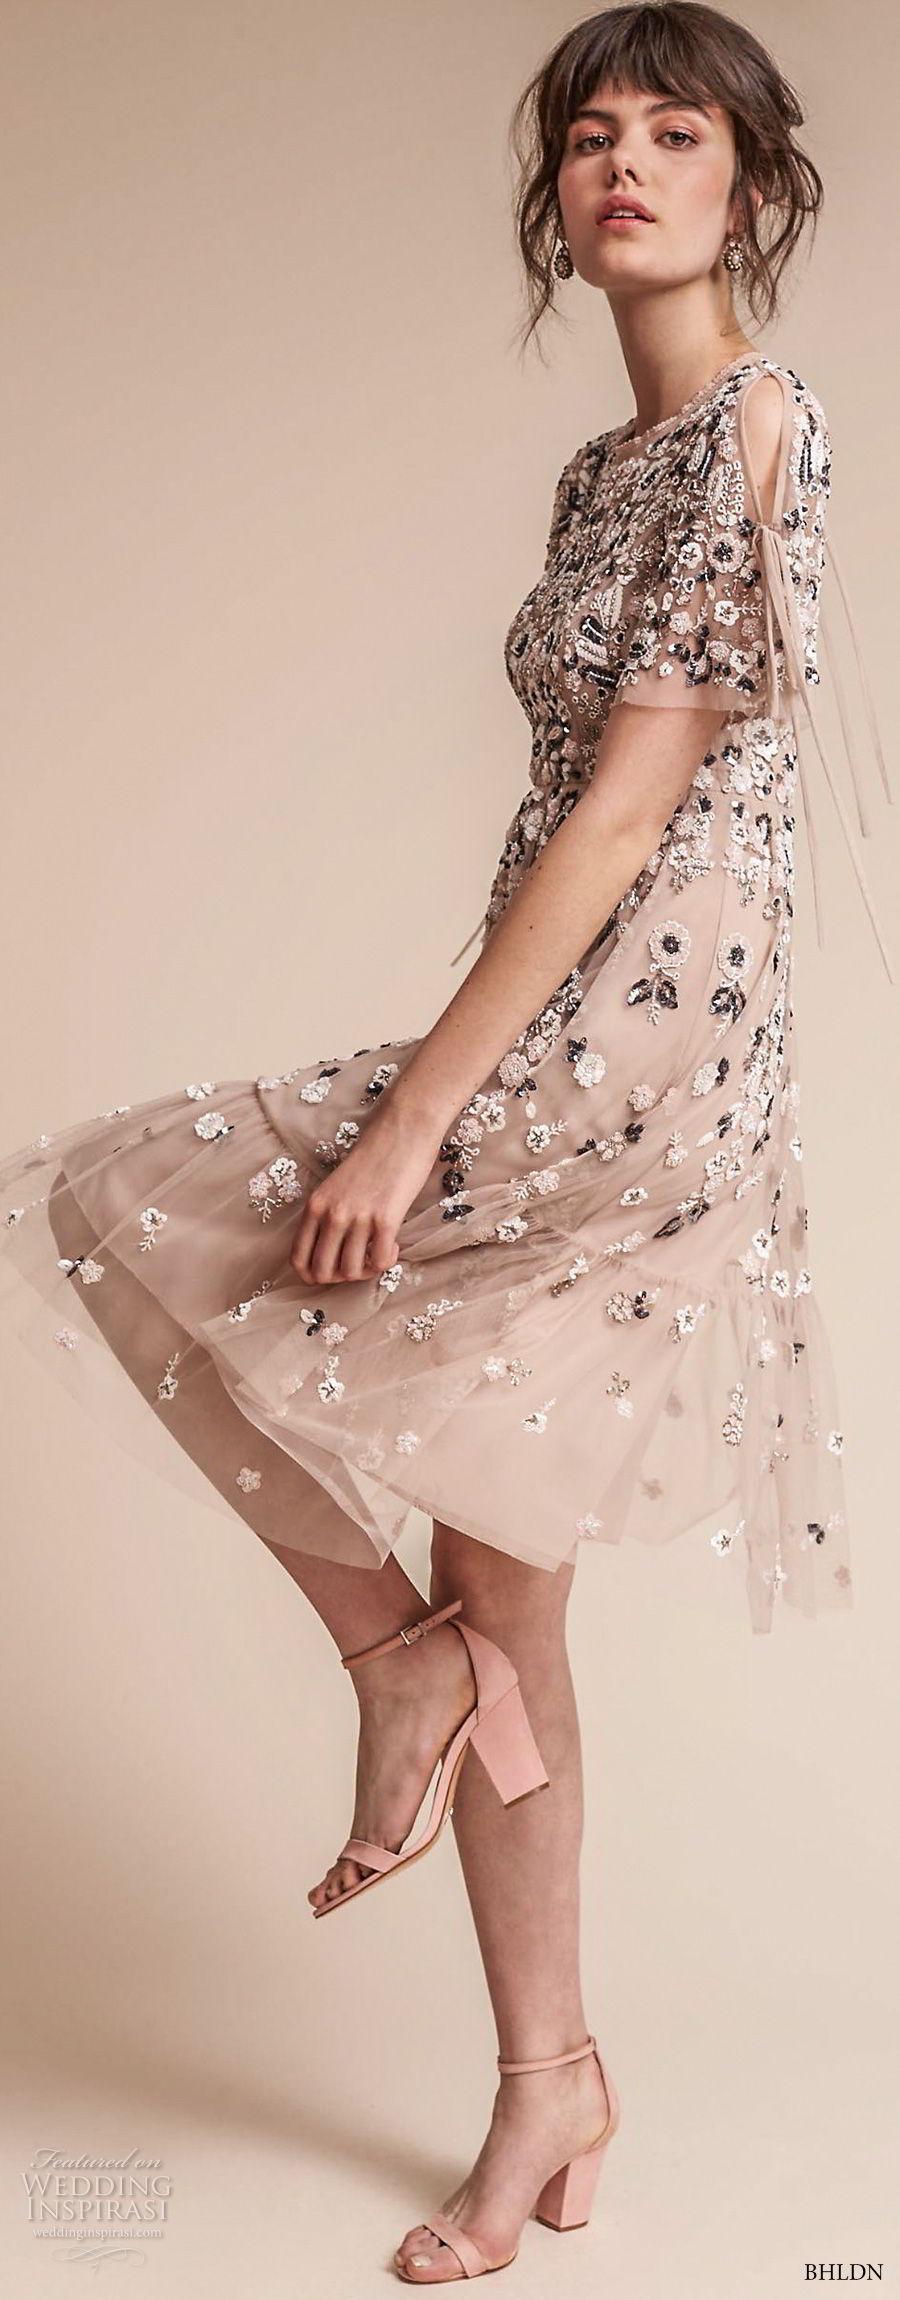 bhldn fall 2017  americana bridal short sleeves jewel neck full embellishment romantic pretty creme color above knee short wedding dress keyhole back (majorca) sdv